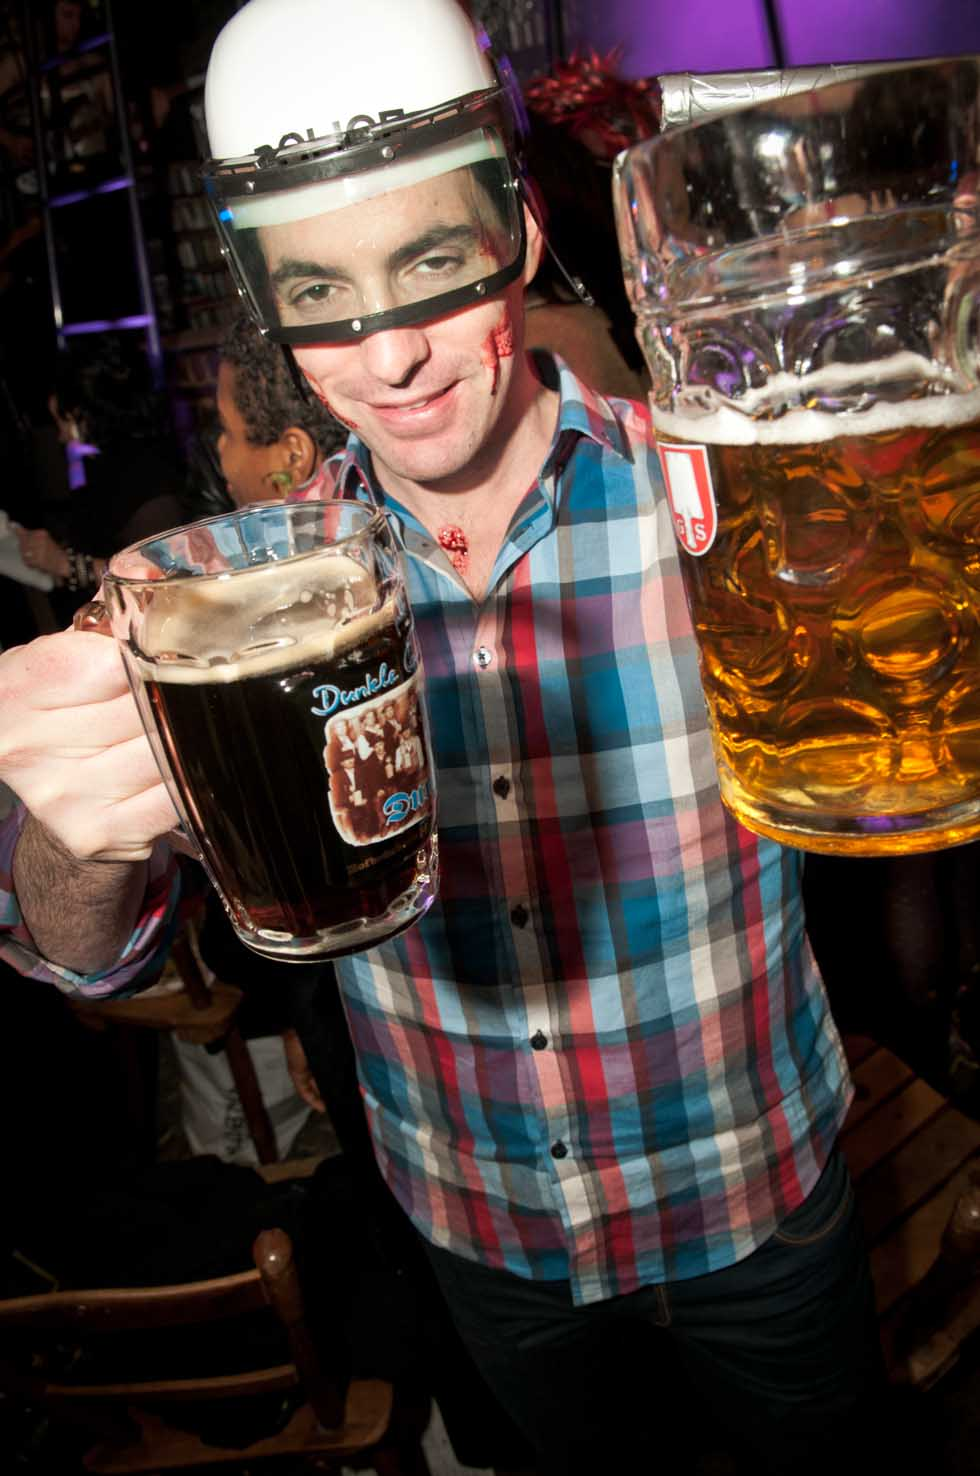 zum-schneider-nyc-2012-karneval-apocalyptika-3936.jpg